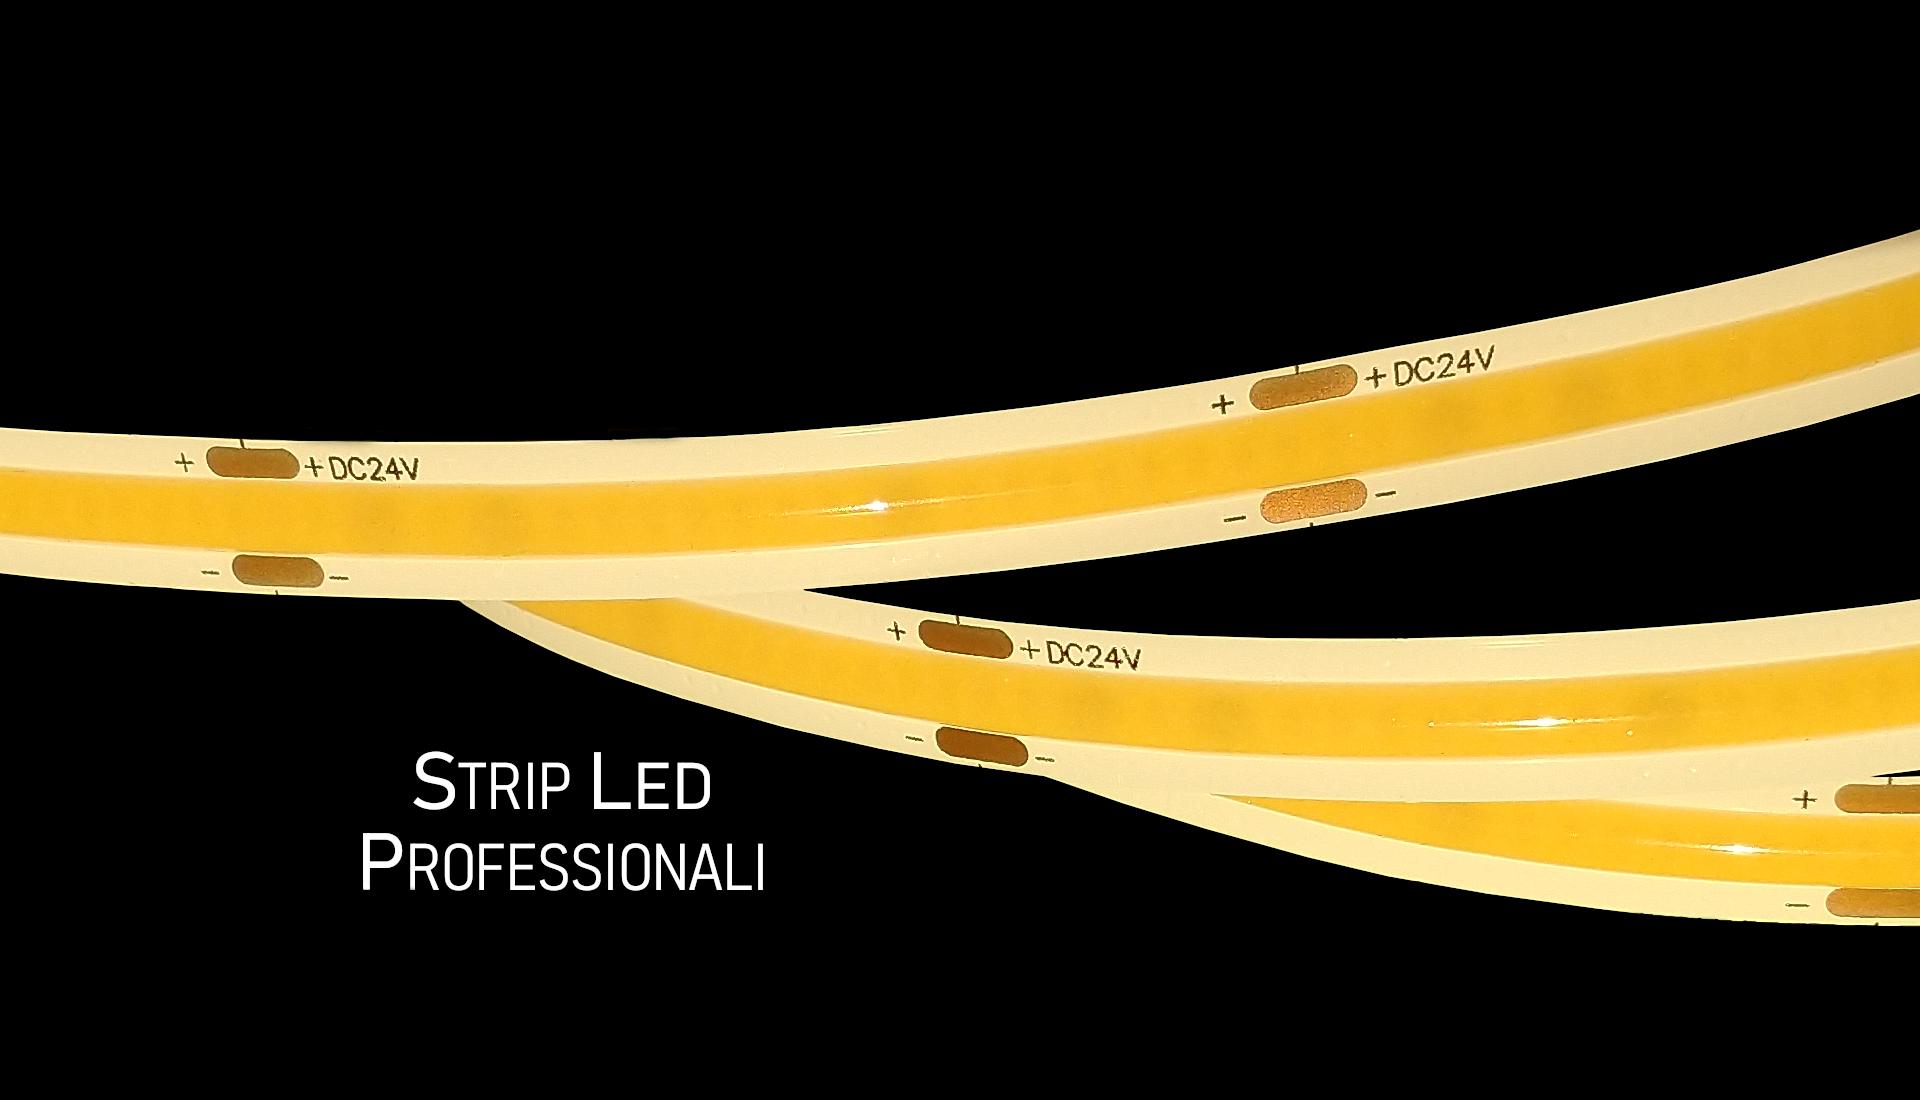 strip_led